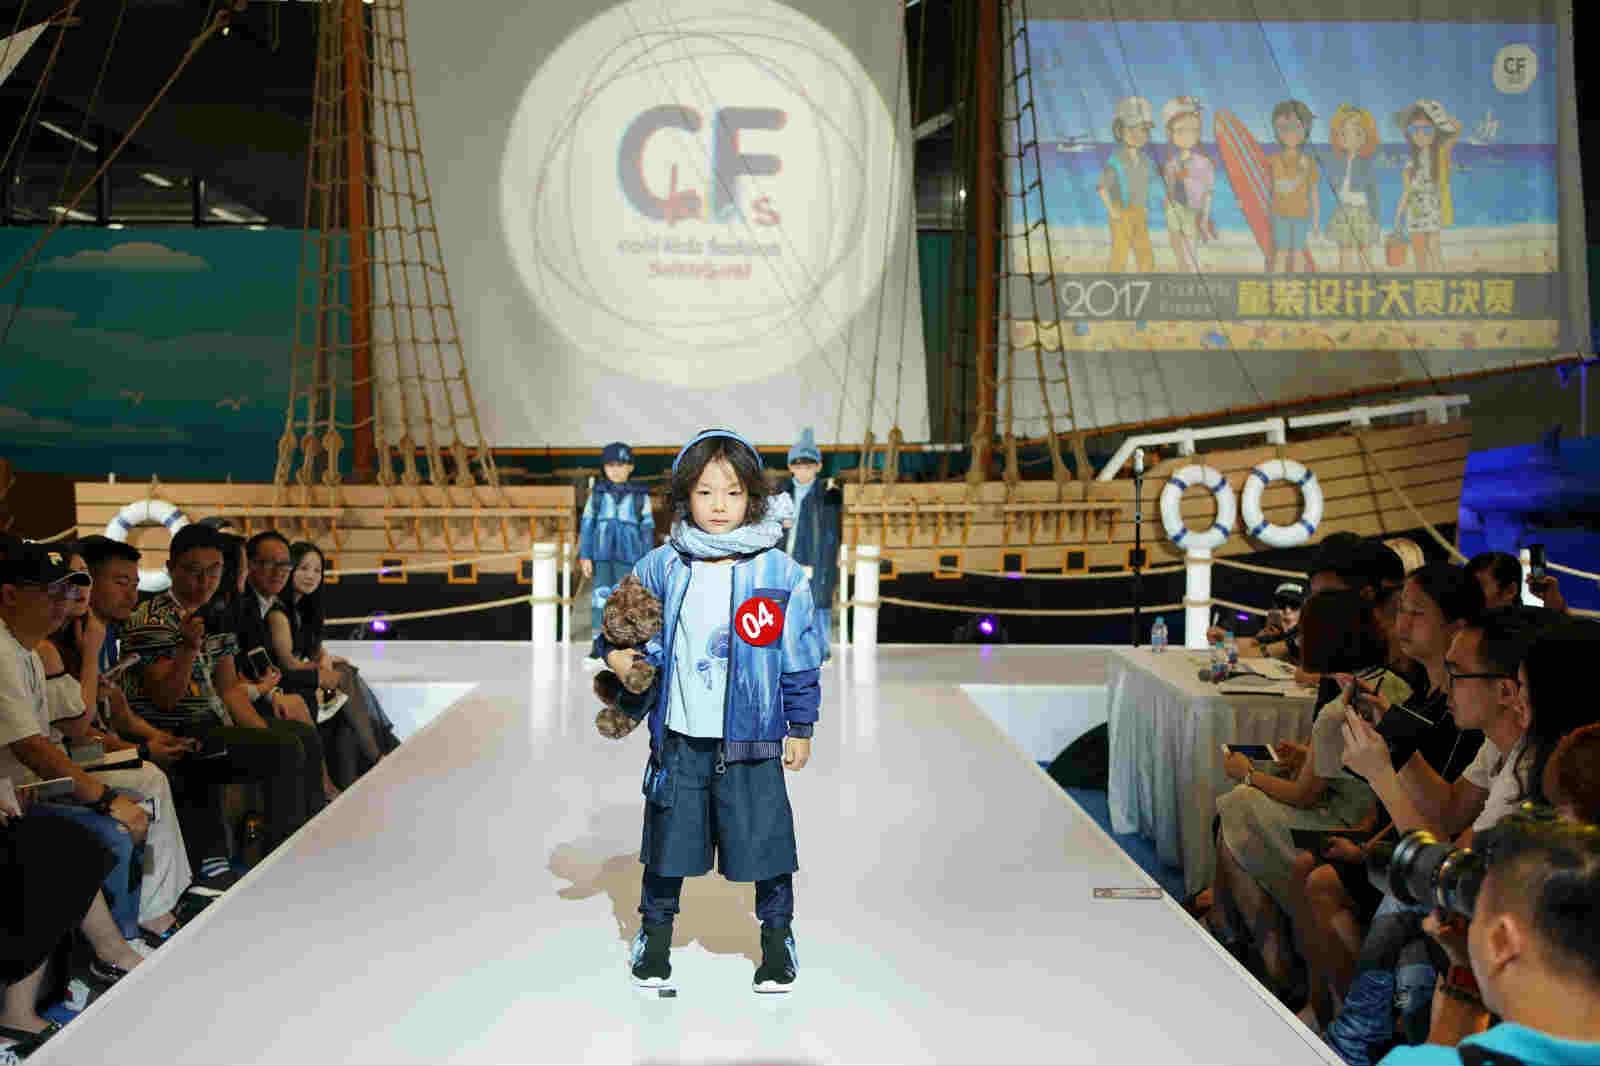 2017  Cool Kids Fashion童装设计大赛现场.jpg